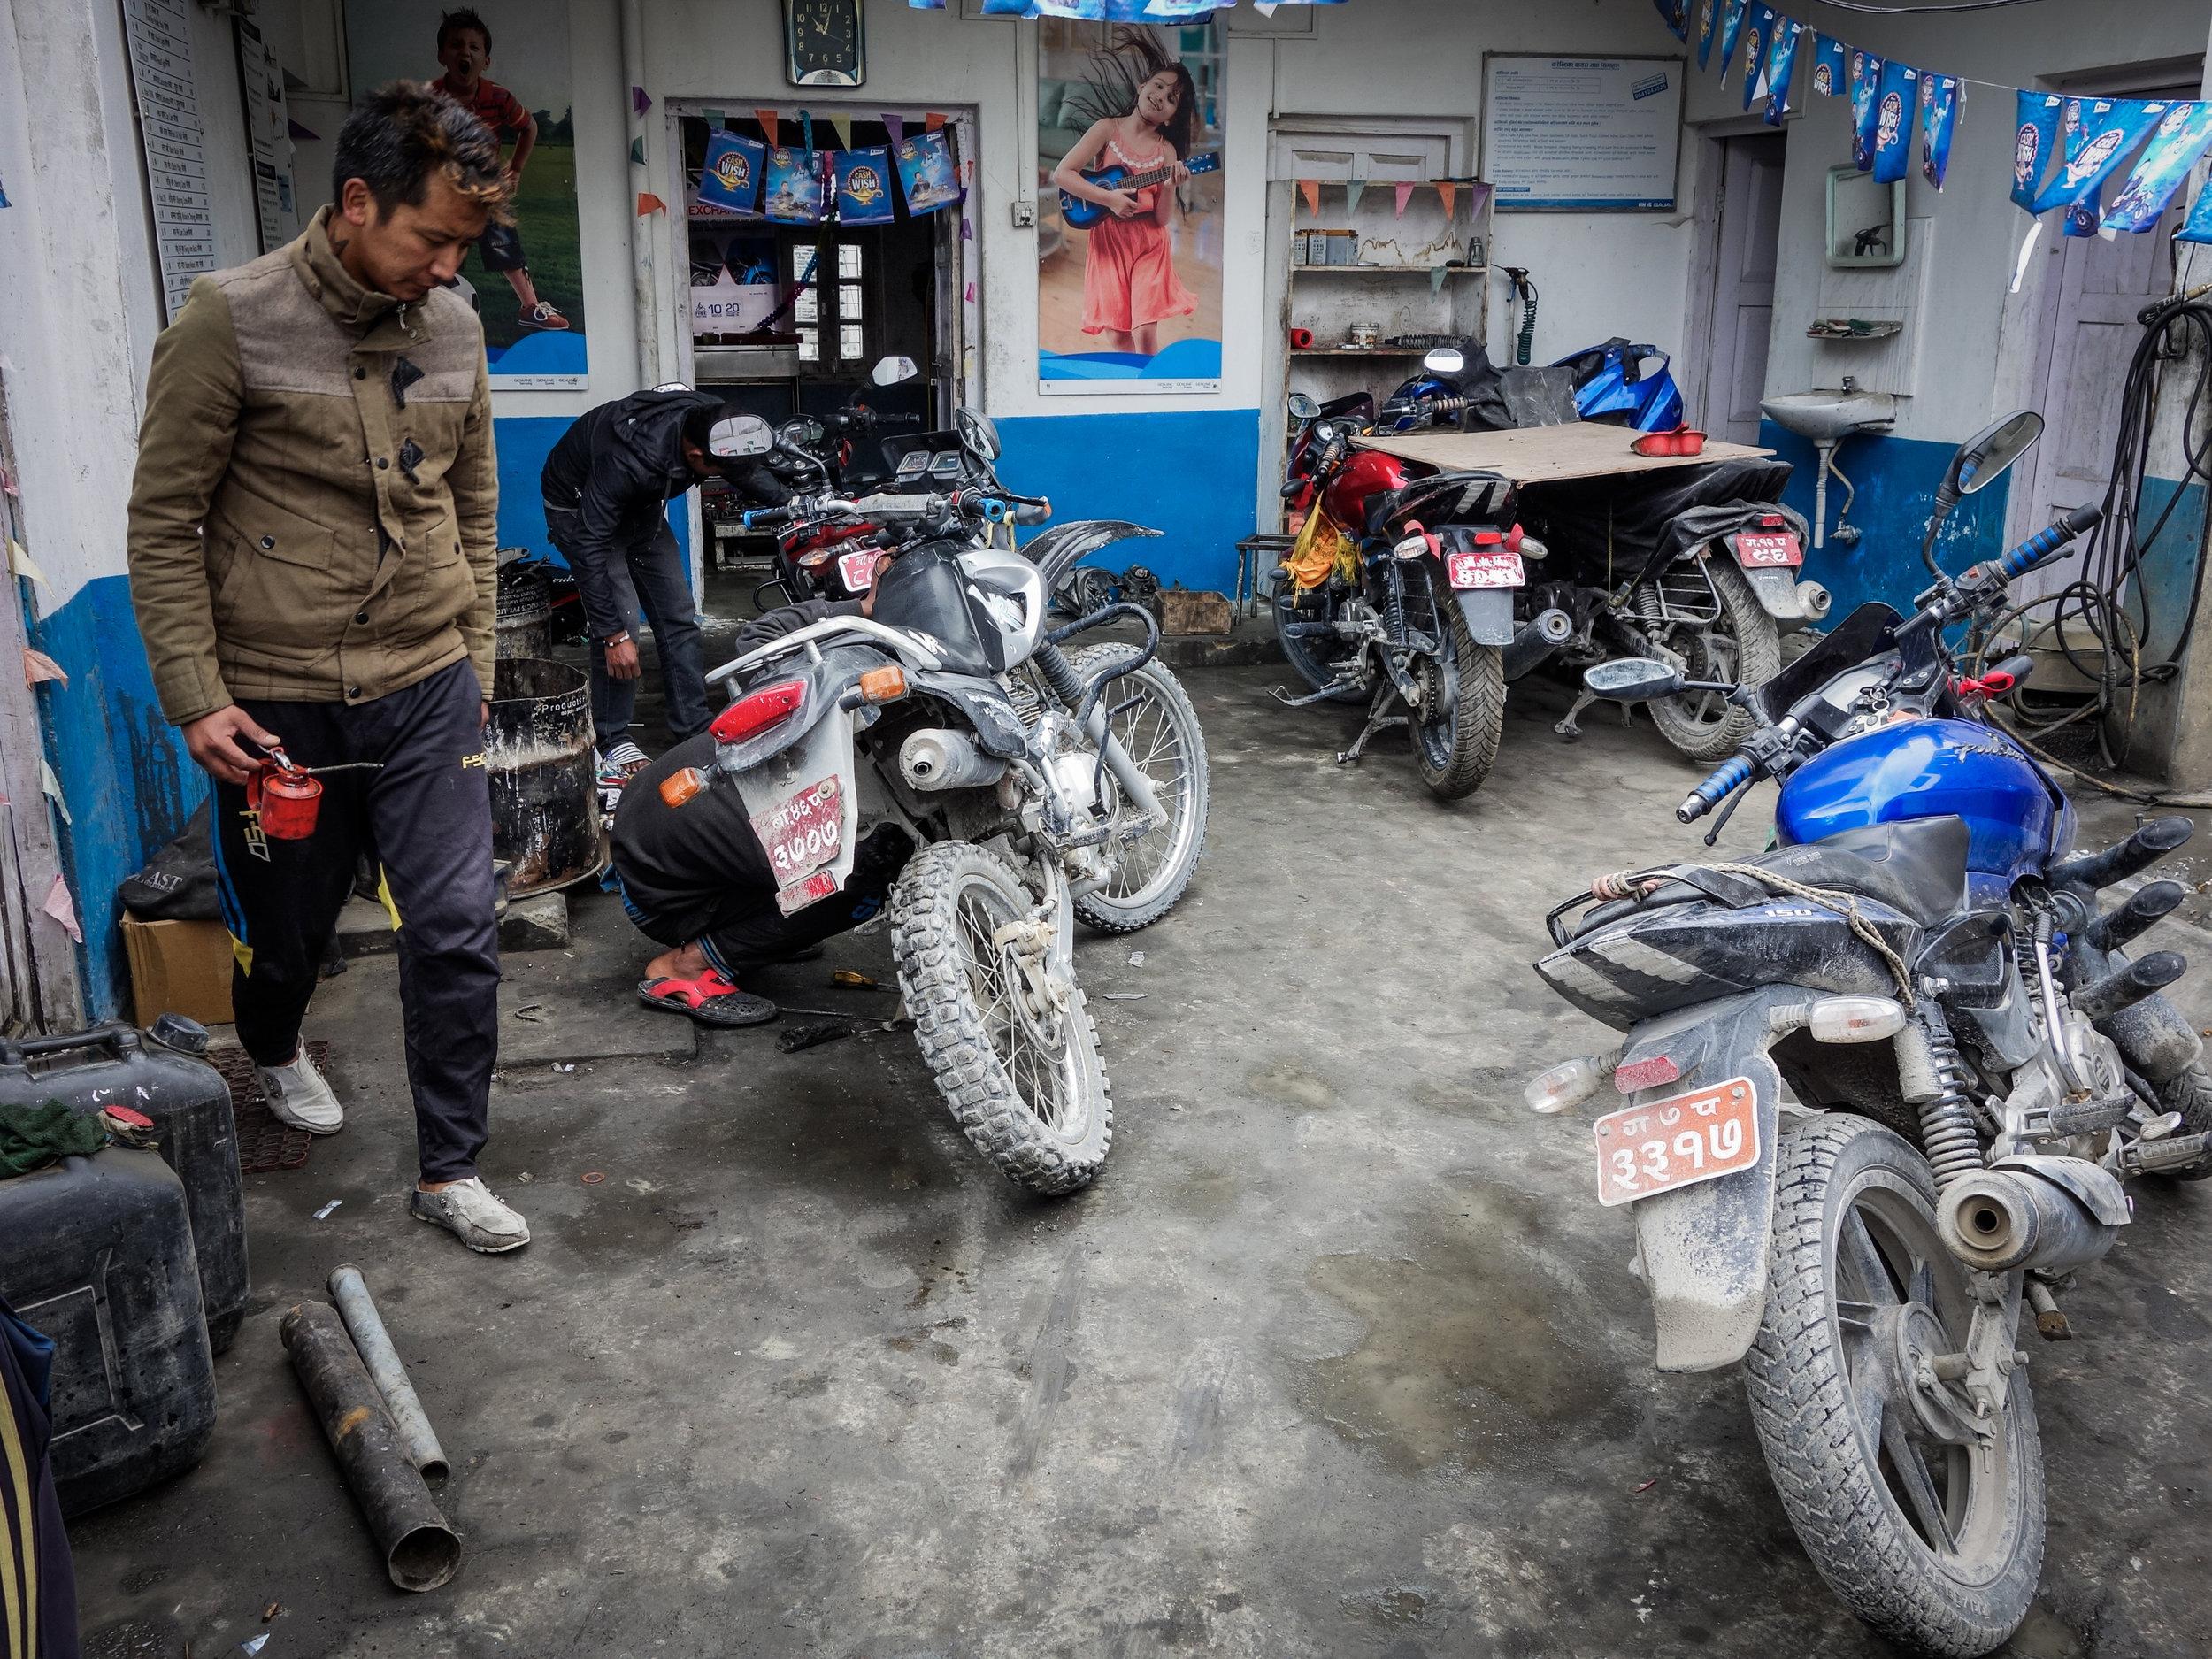 TWHMC-nepal-motorcycle-adventure-2016-03878-2.jpg